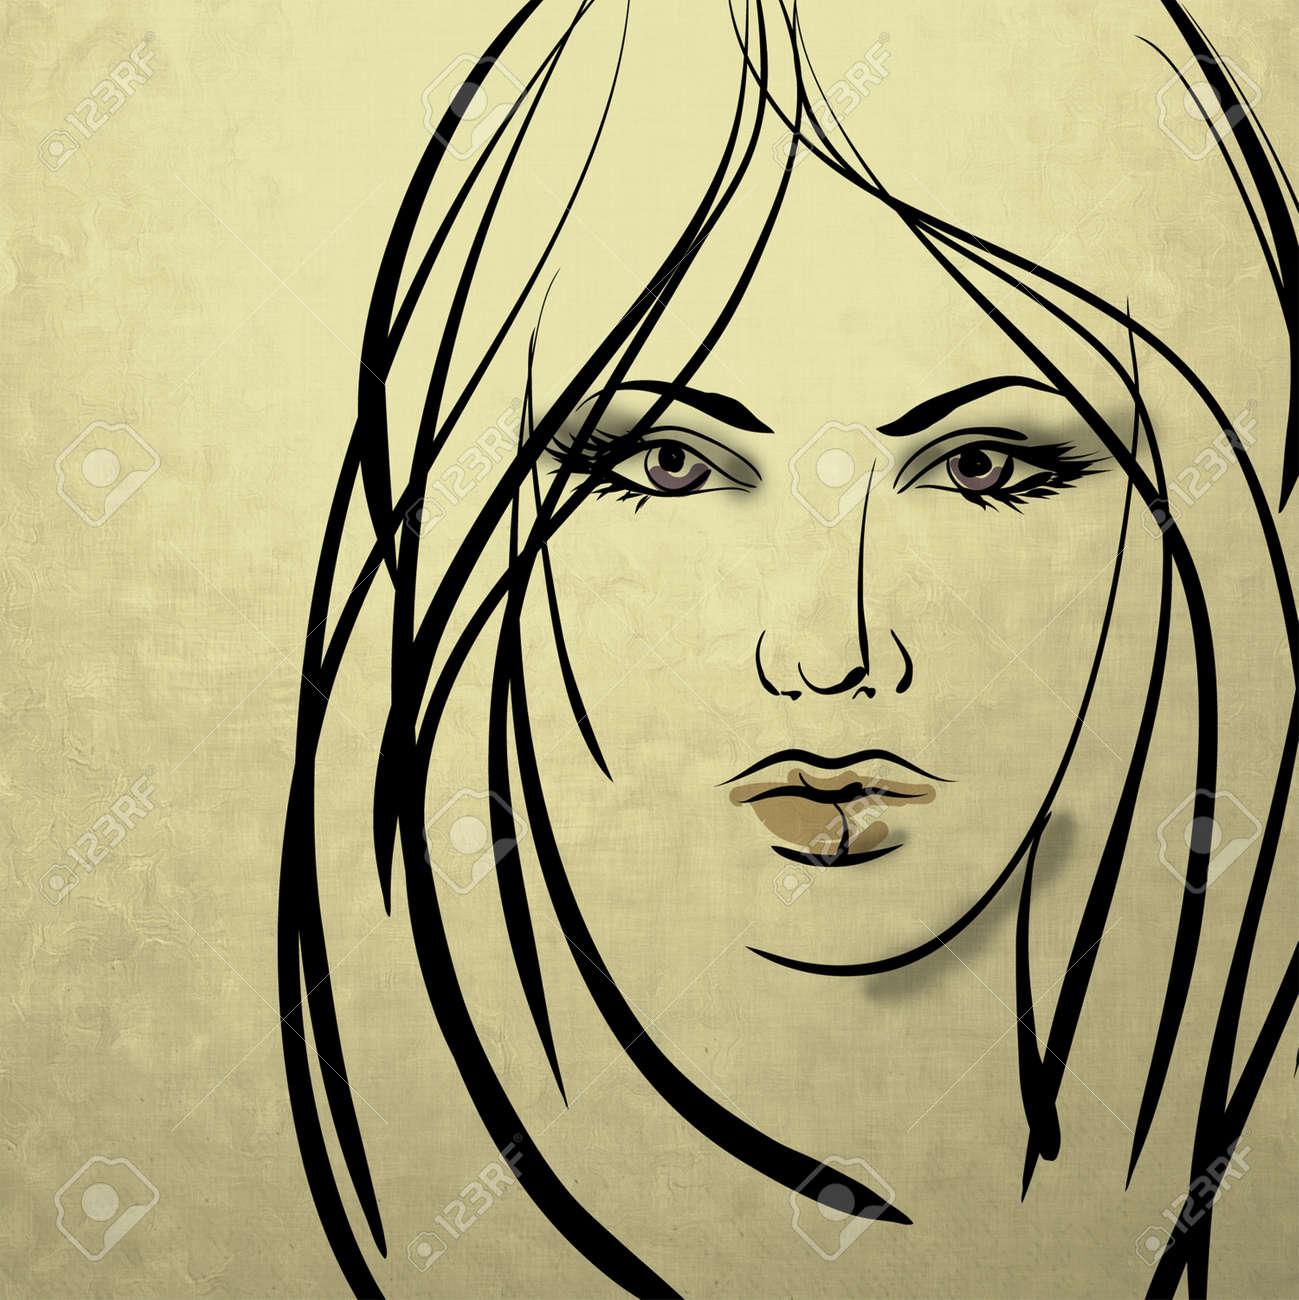 Retro Pop Art Girl Background | Stock Photo | Colourbox